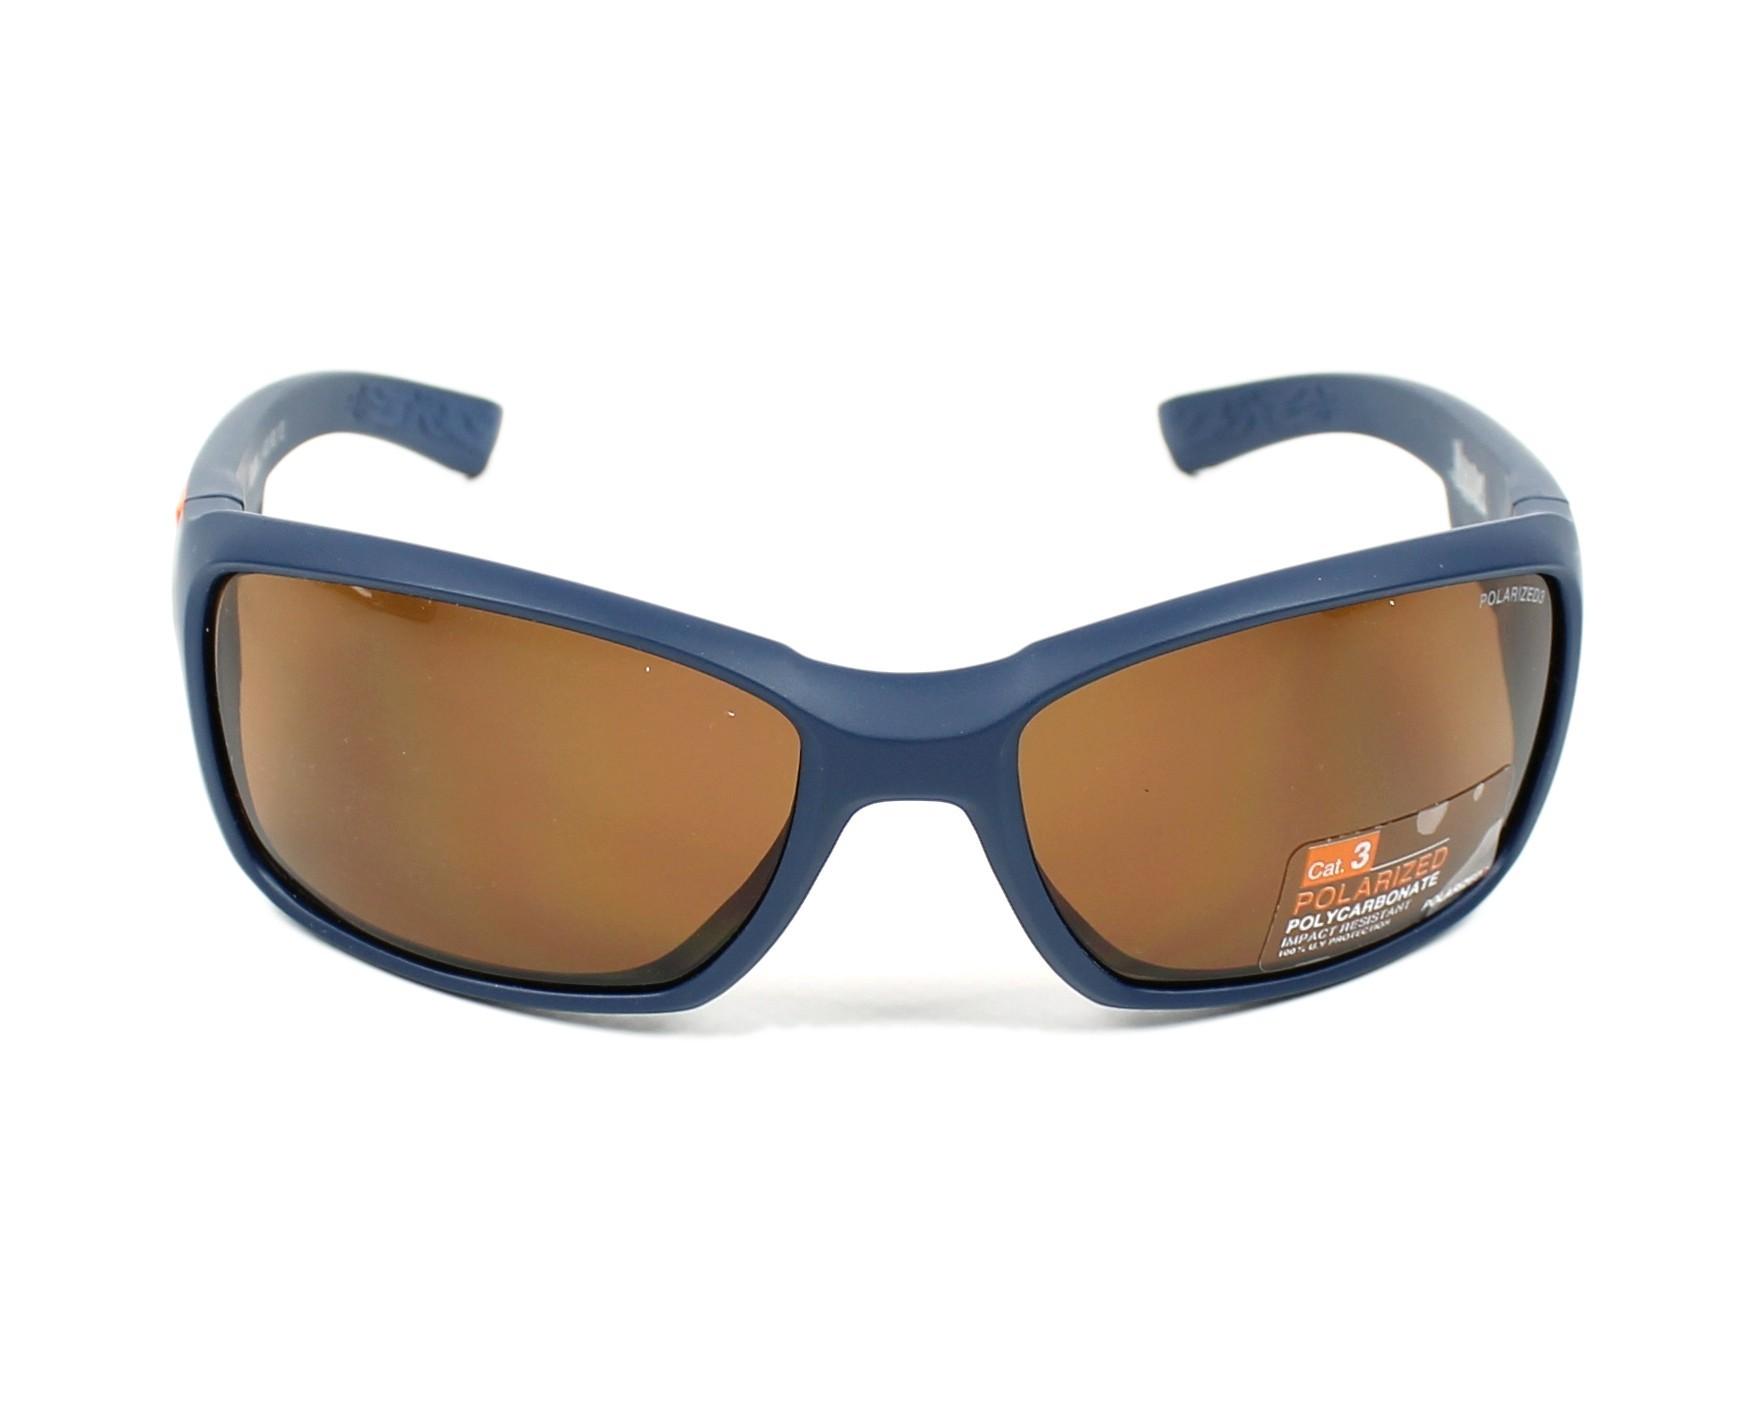 lunettes de soleil julbo j400 9012 bleu avec des verres marron. Black Bedroom Furniture Sets. Home Design Ideas